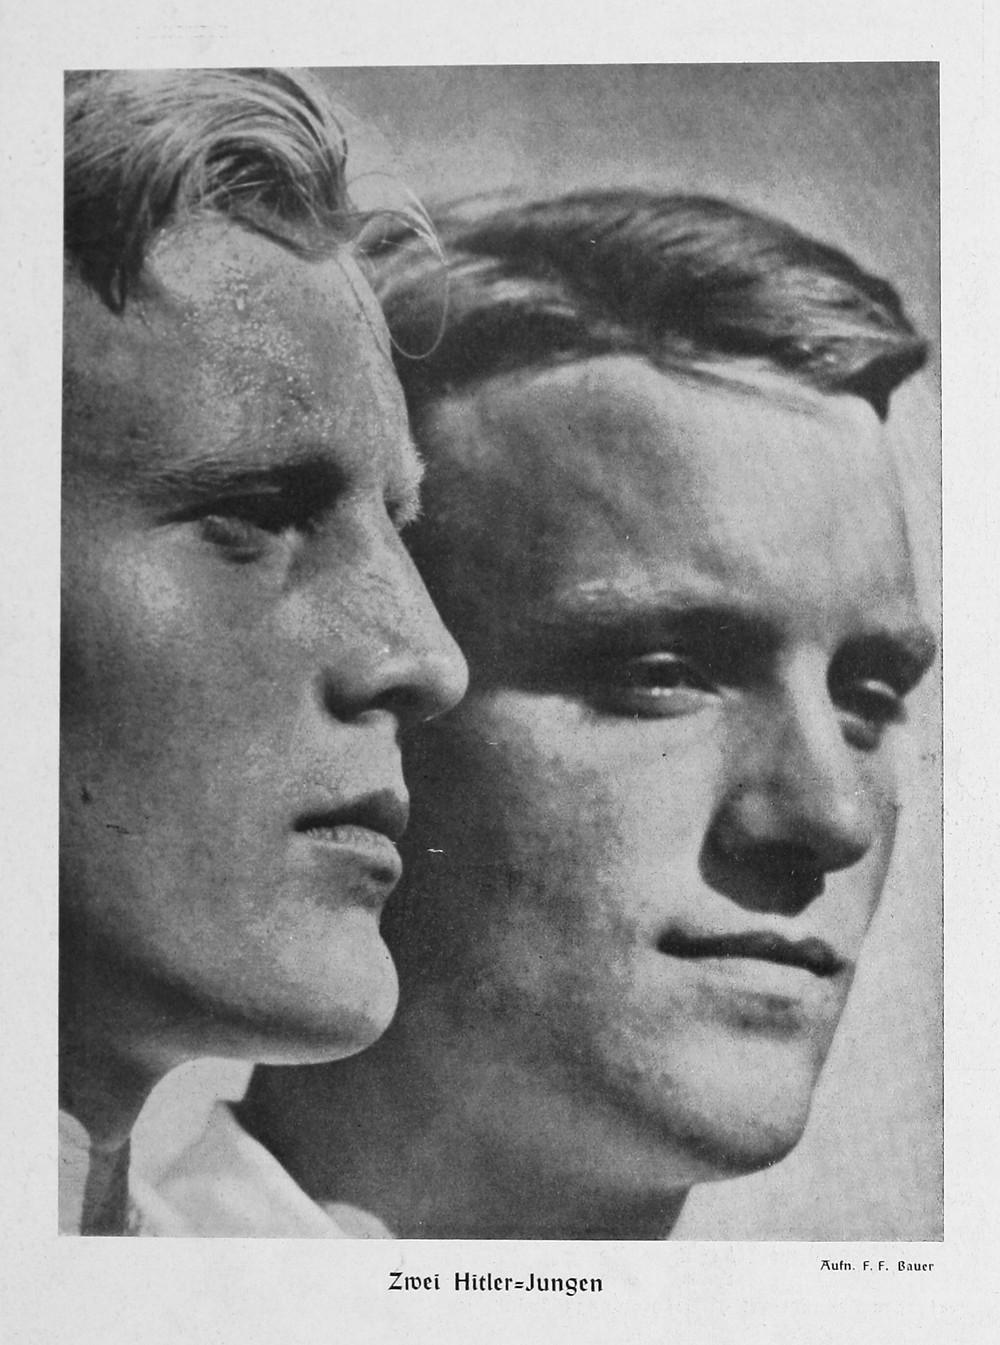 F. F. Bauer, Volk und Rasse, Heft 9 September 1942 – backcover 'Zwei Hitler-Jungen'